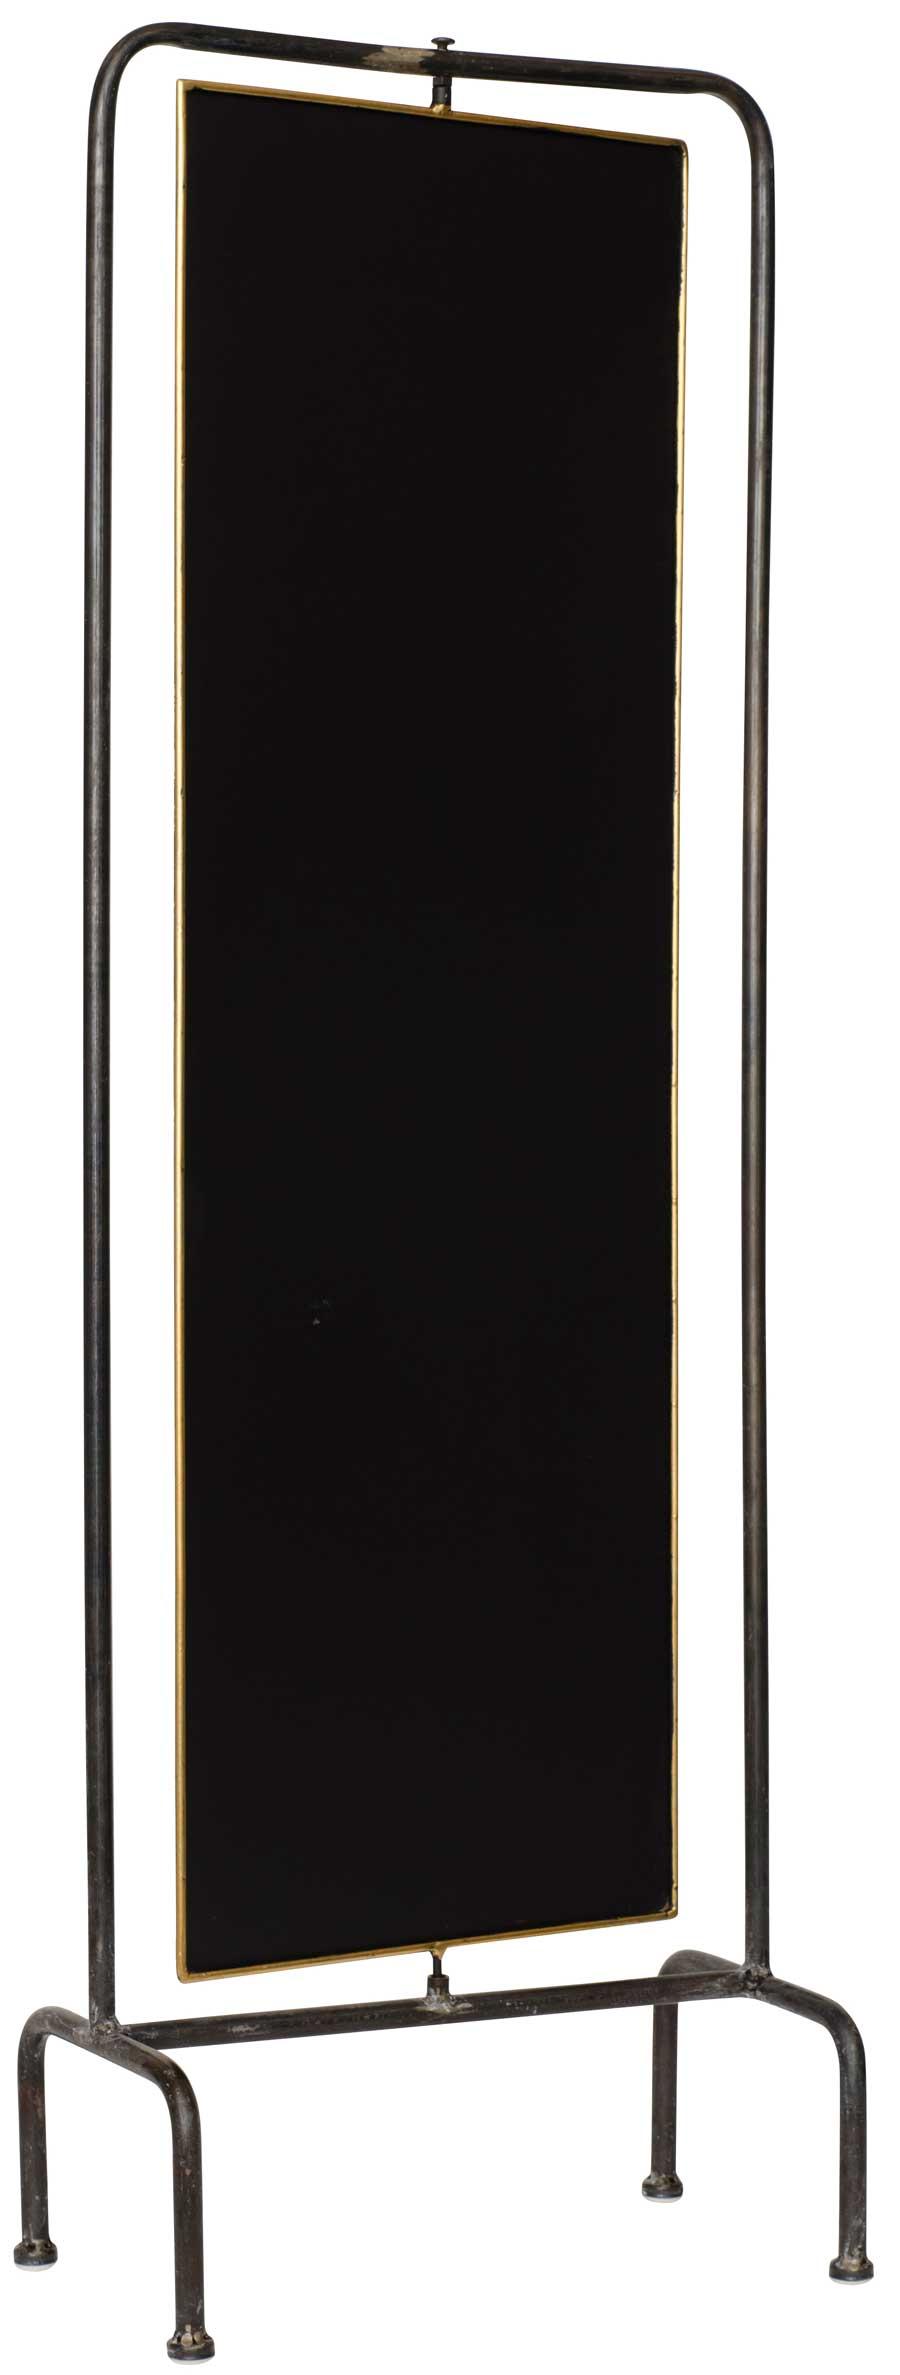 ib laursen – Ib laursen tavle - sort metal, stående metalramme, (104x21cm) på boboonline.dk